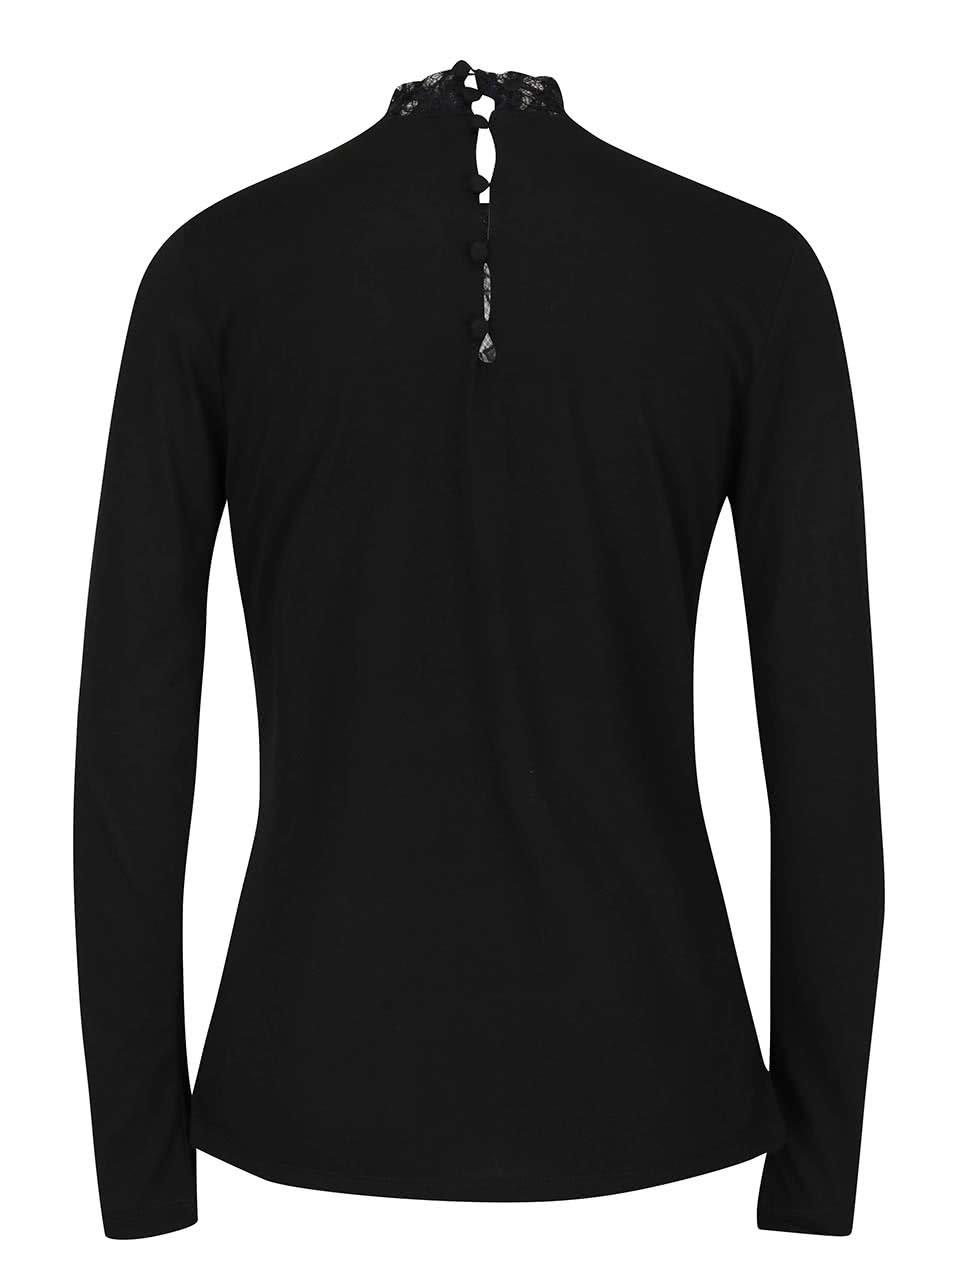 Čierne dámske tričko s čipkou PEP Fabia ... 038812f996f